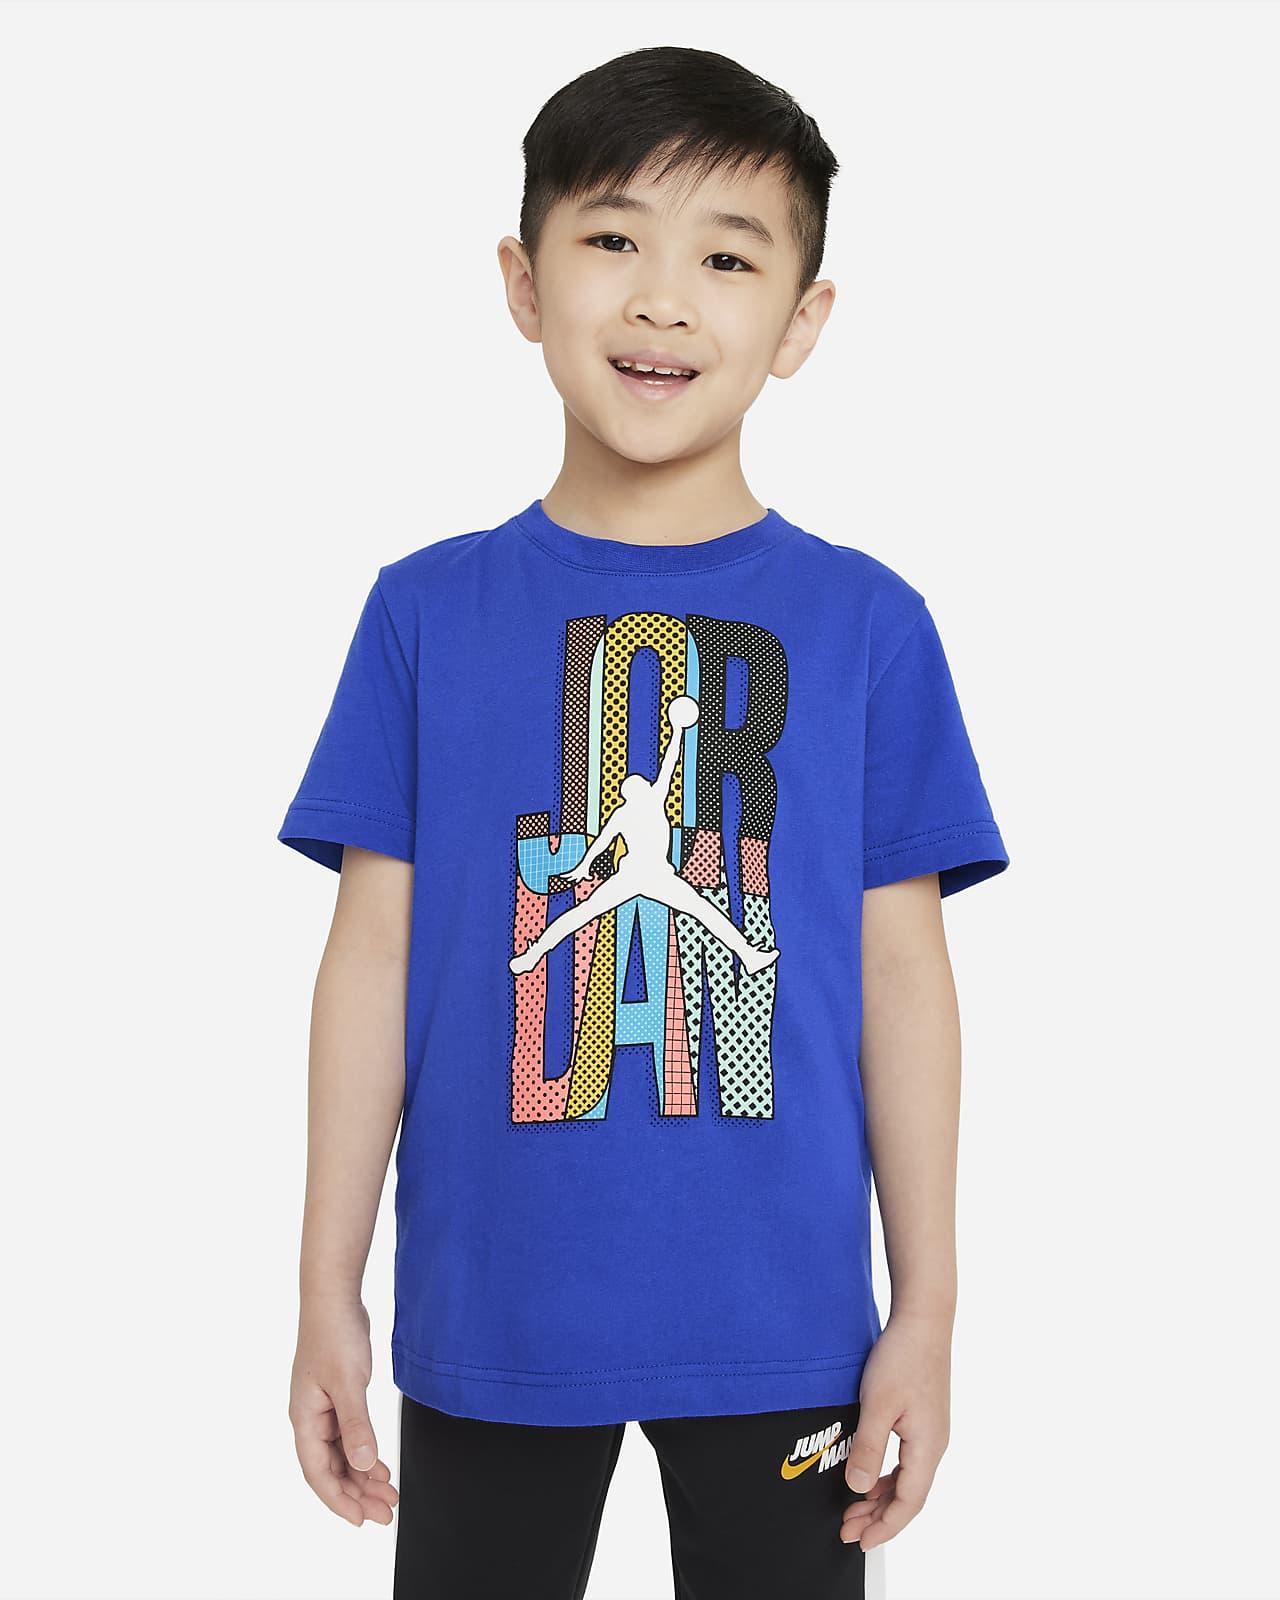 Playera para niños talla pequeña Jordan